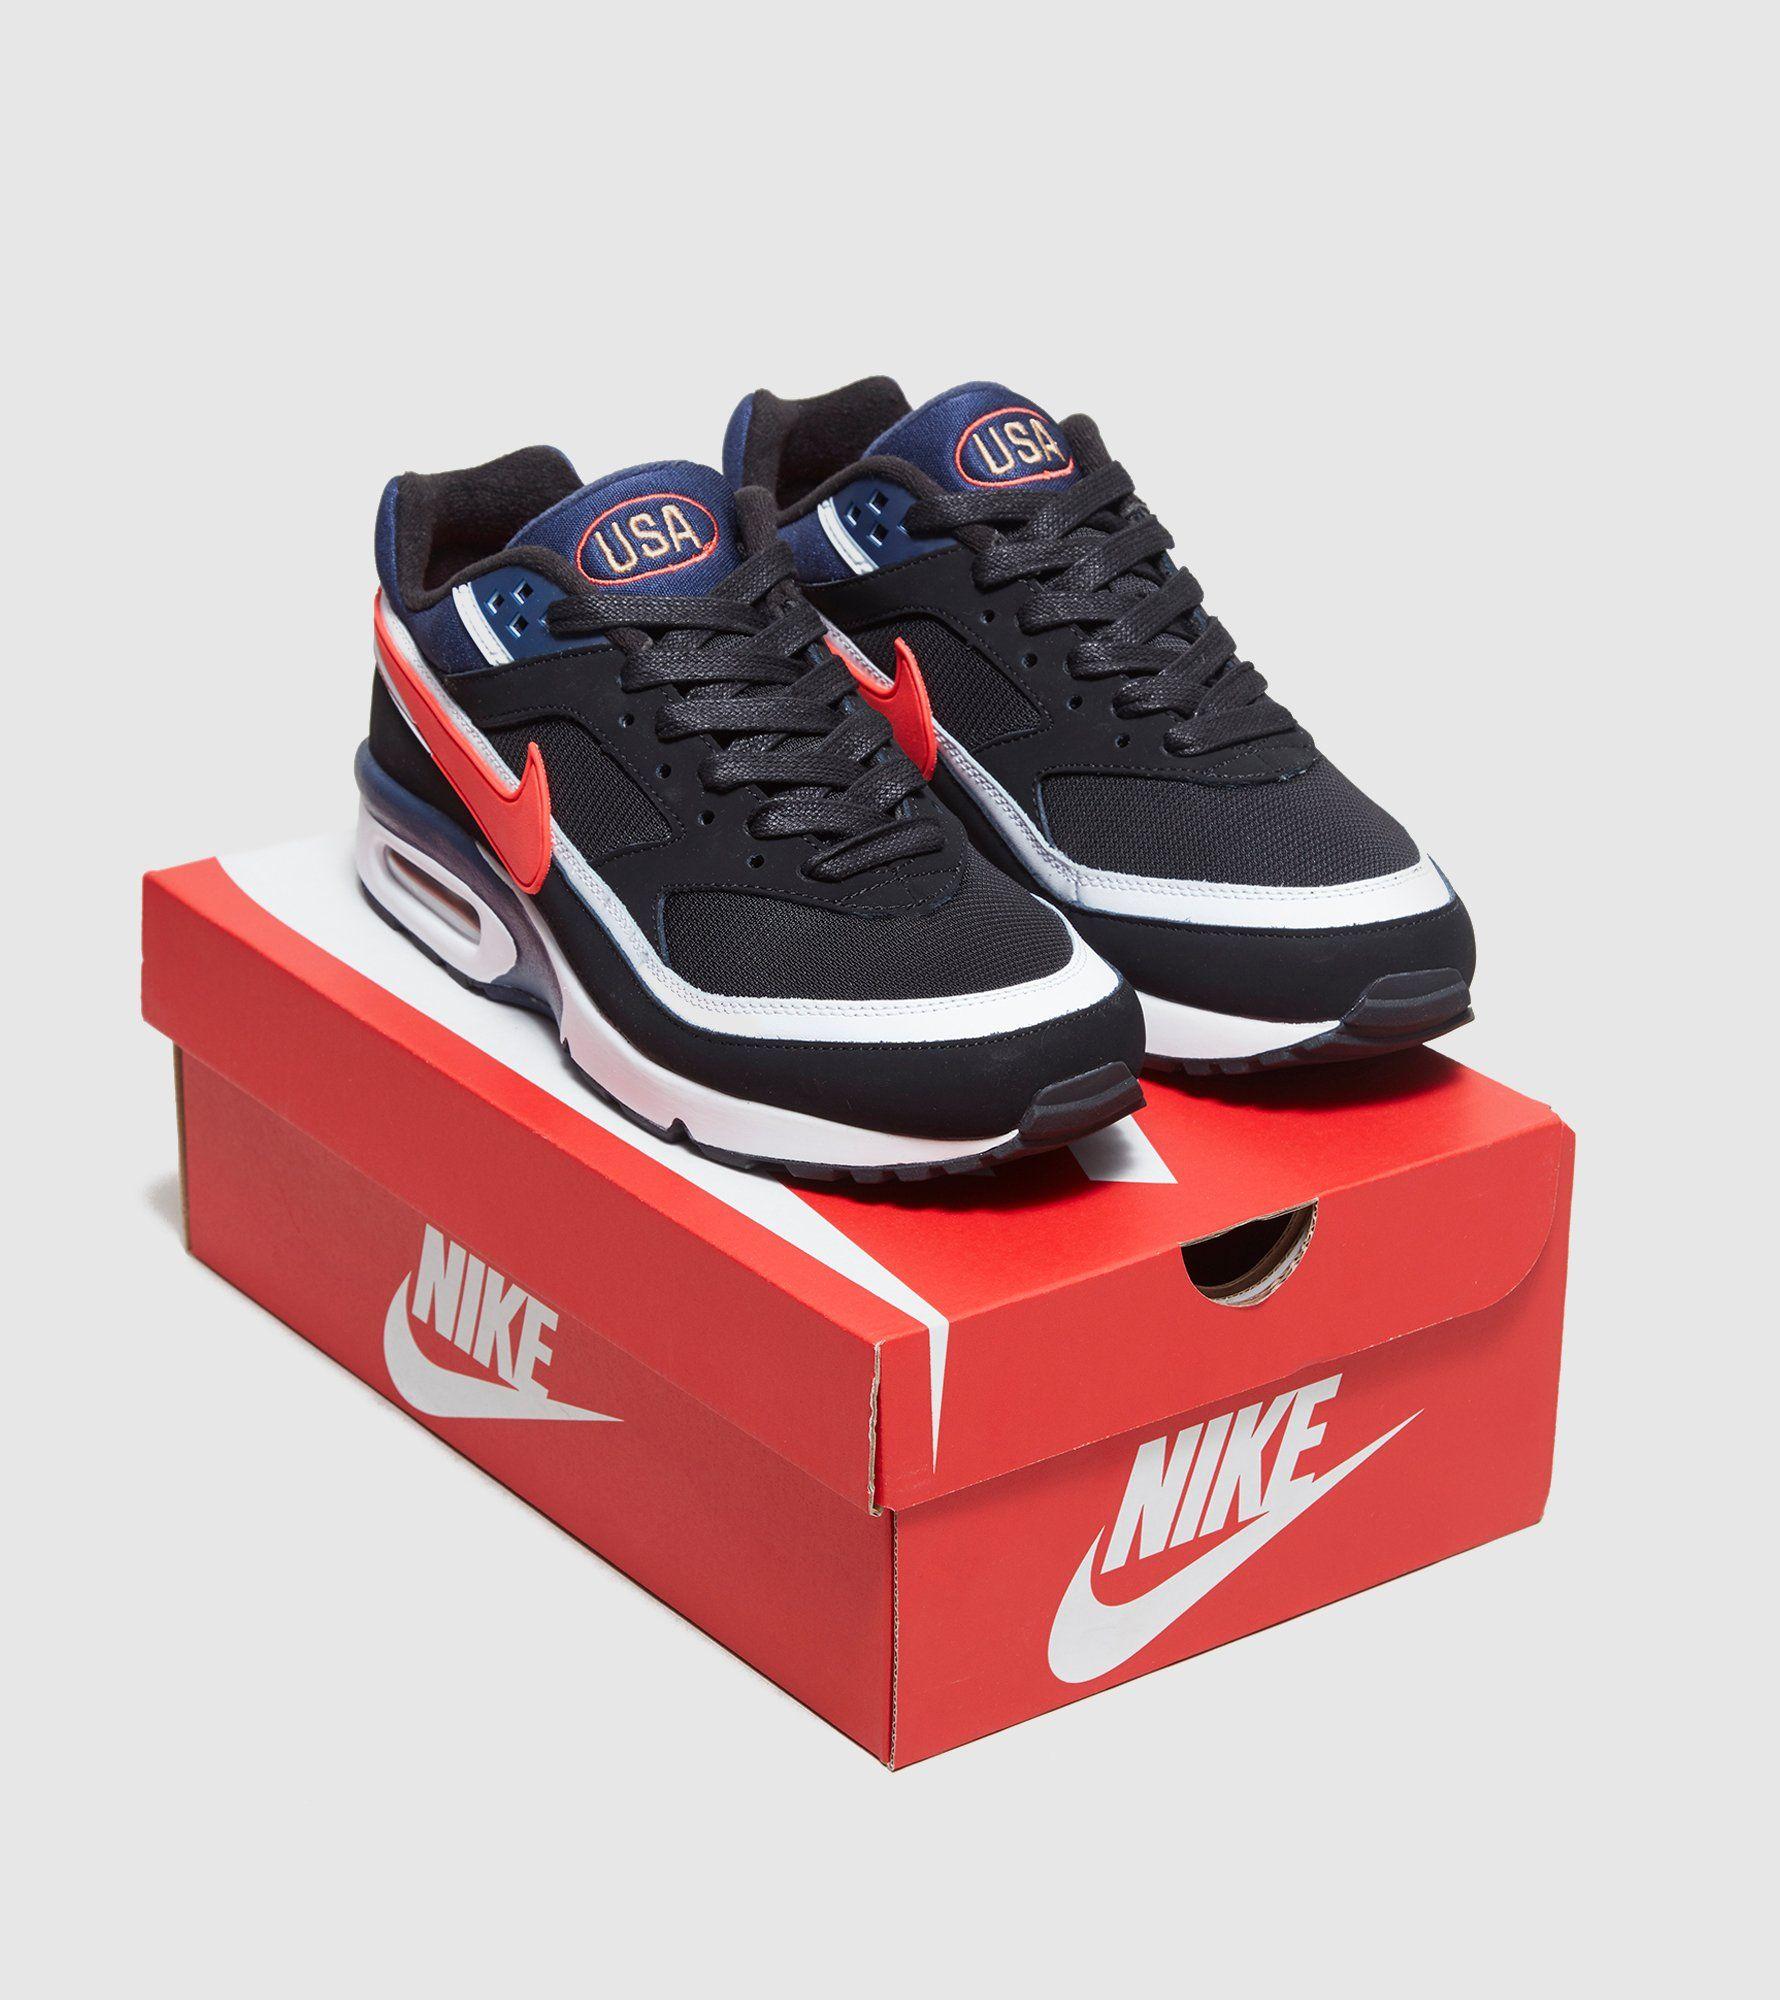 Men's Nike Air Max BW Premium Running Shoes Dark GreyRed